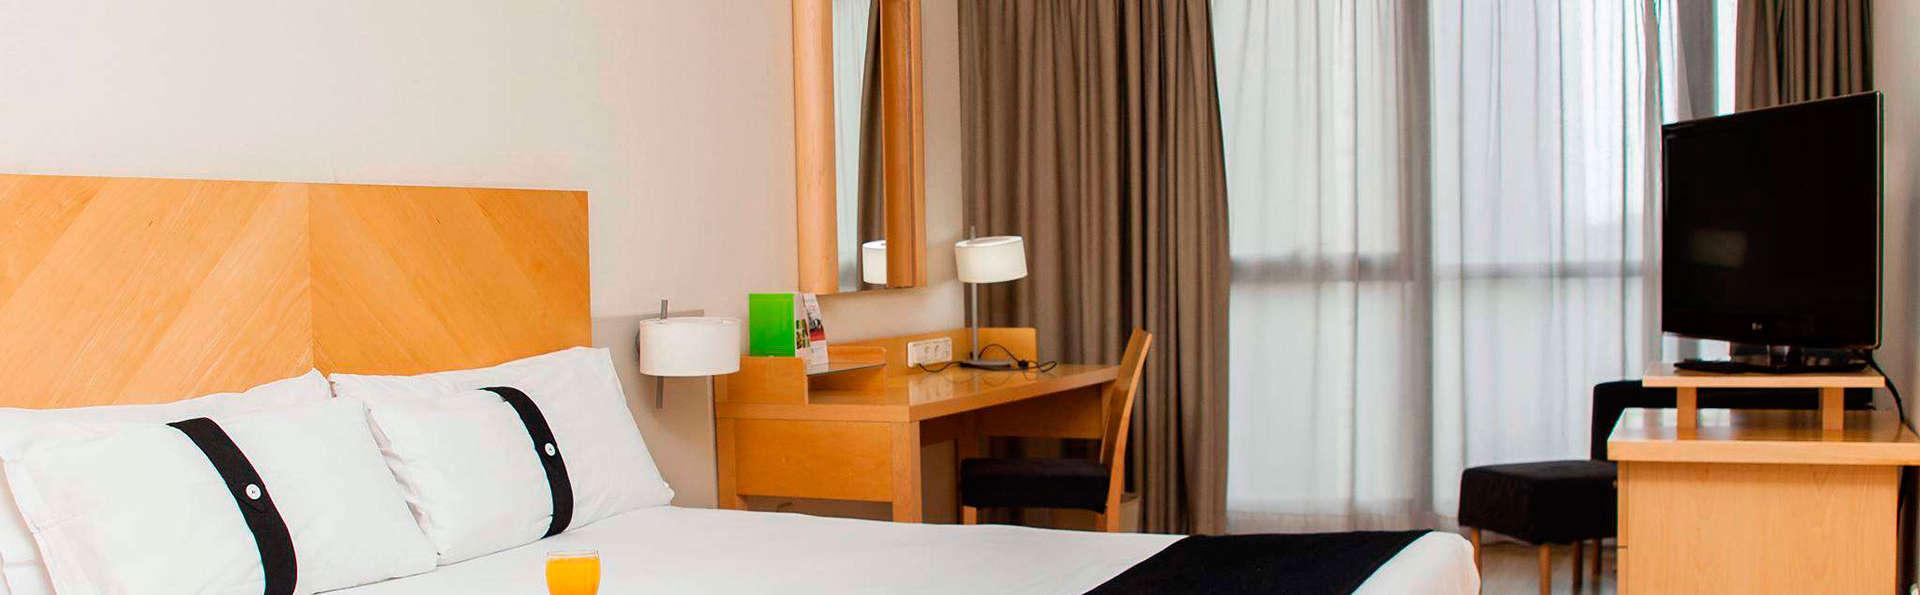 Hotel Alameda Plaza Valencia - EDIT_room3.jpg